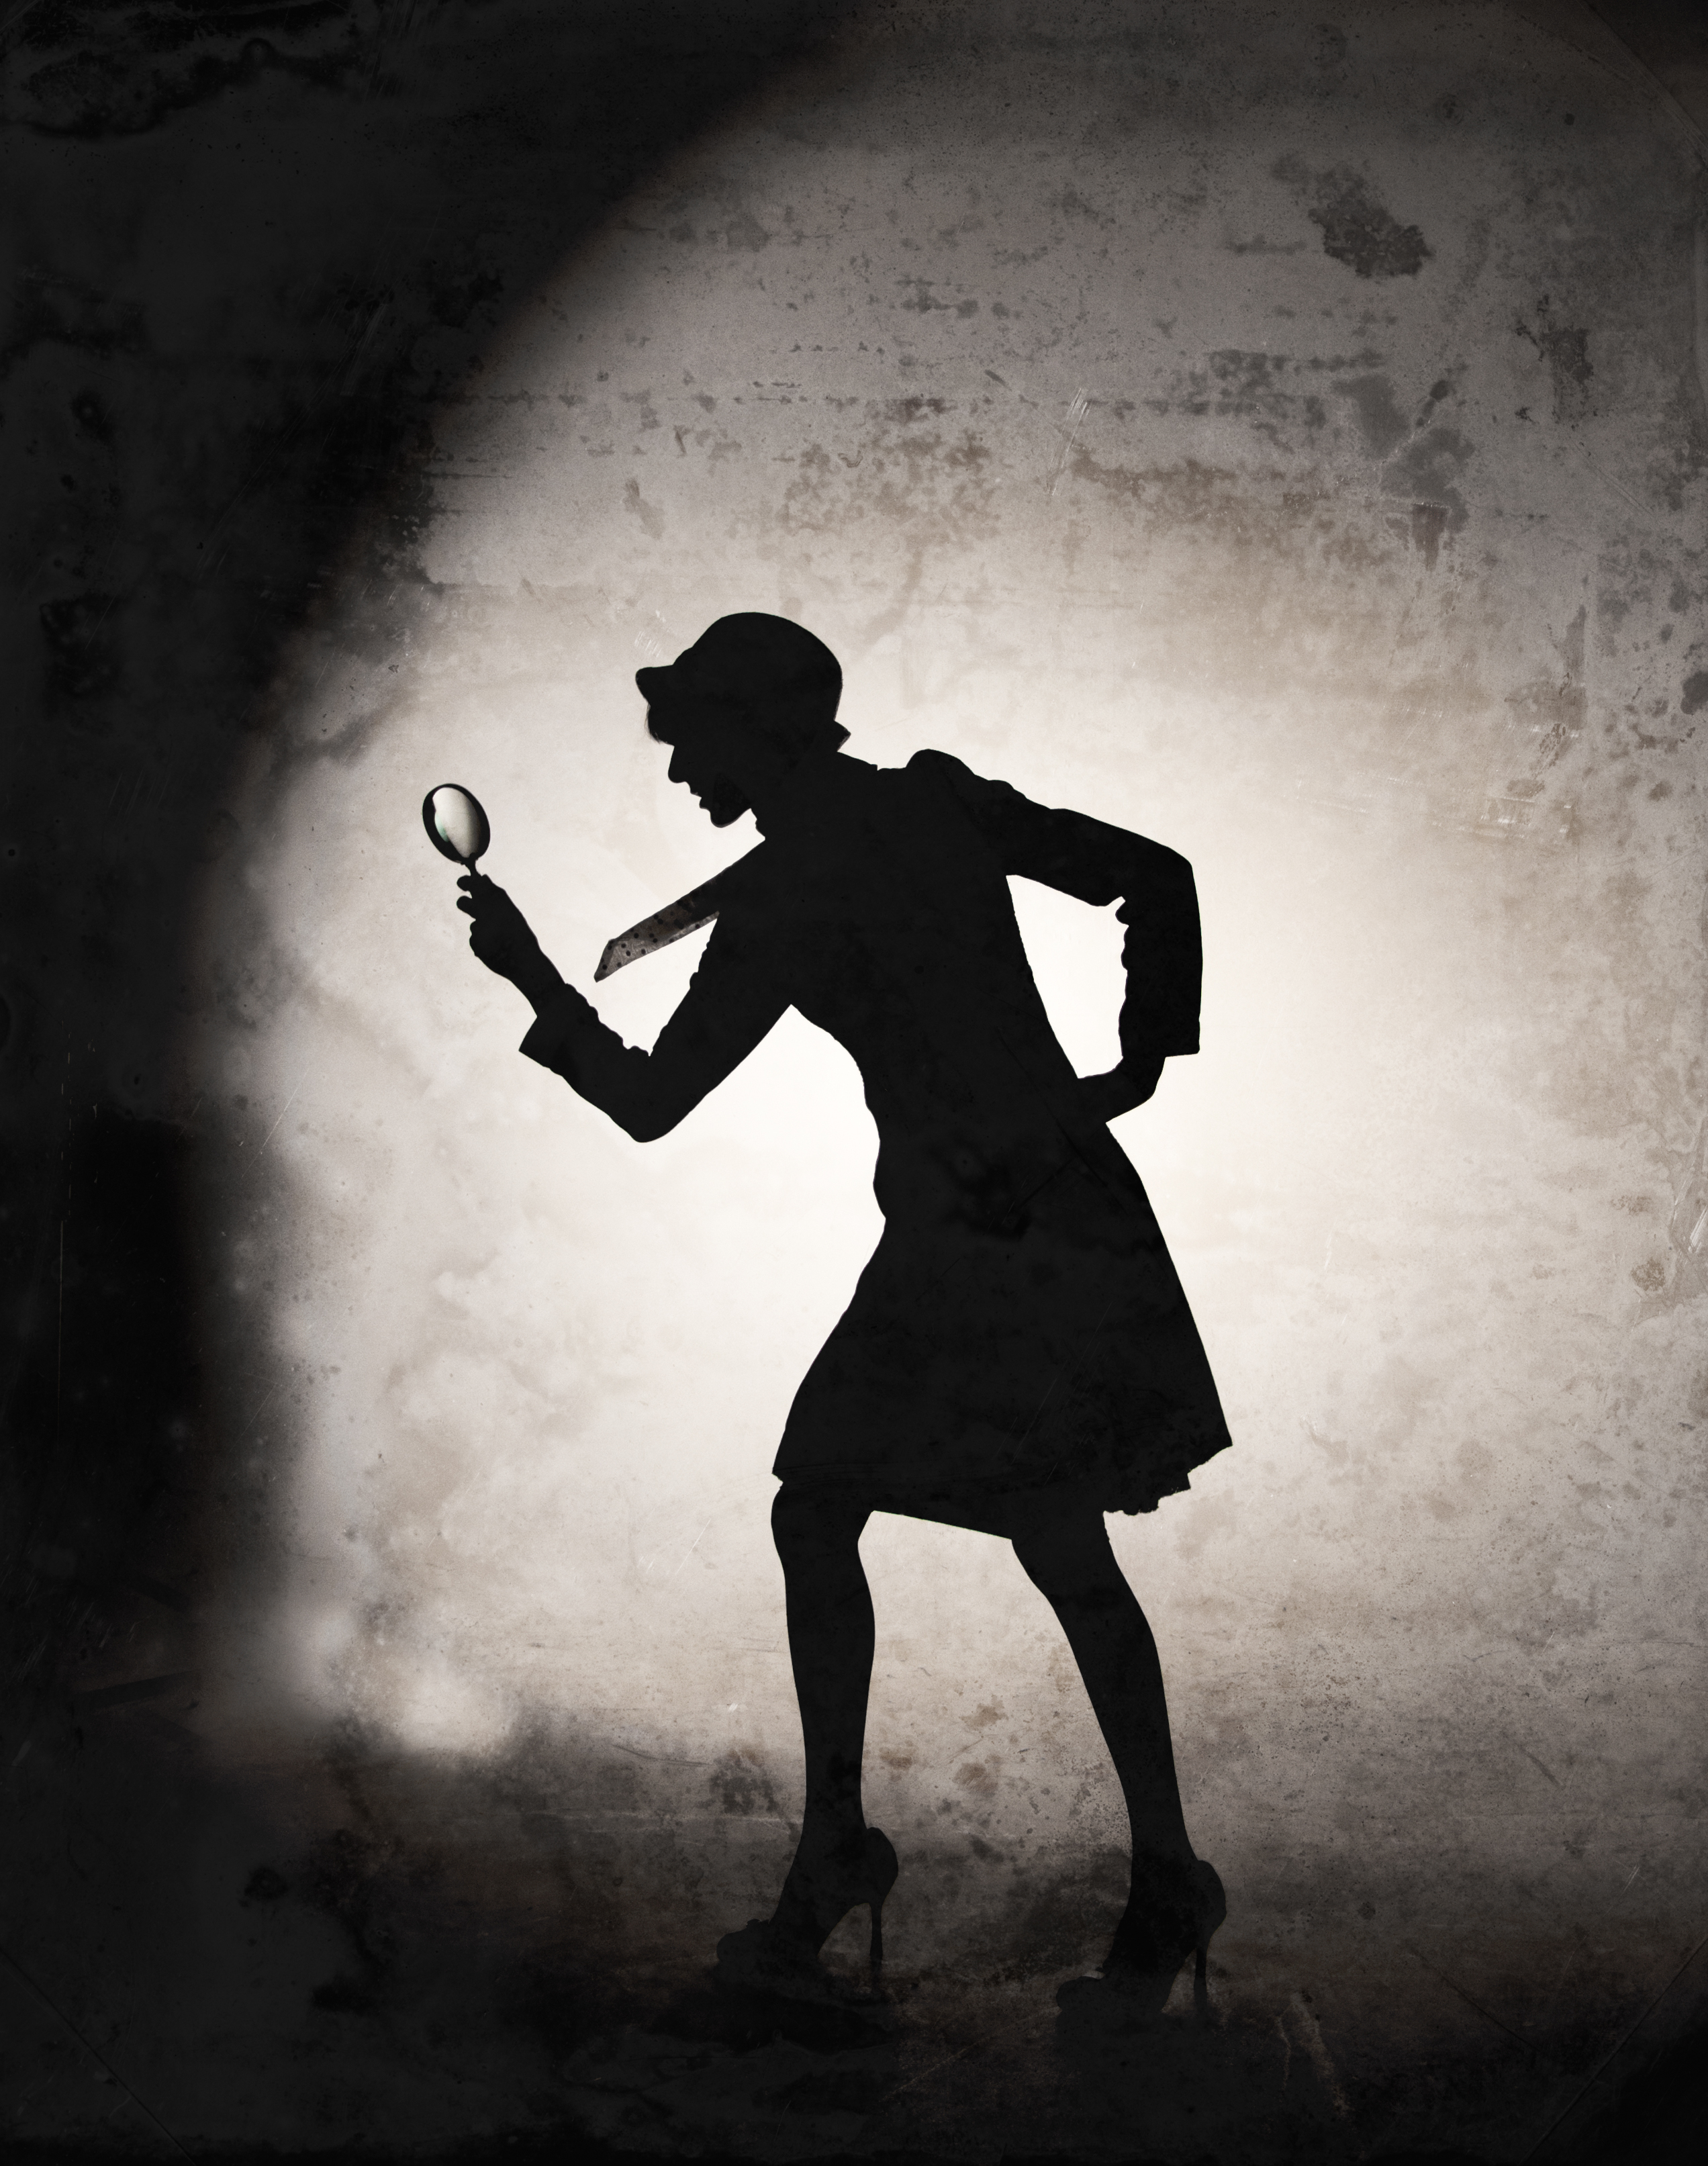 Girl Detective - A.Millette